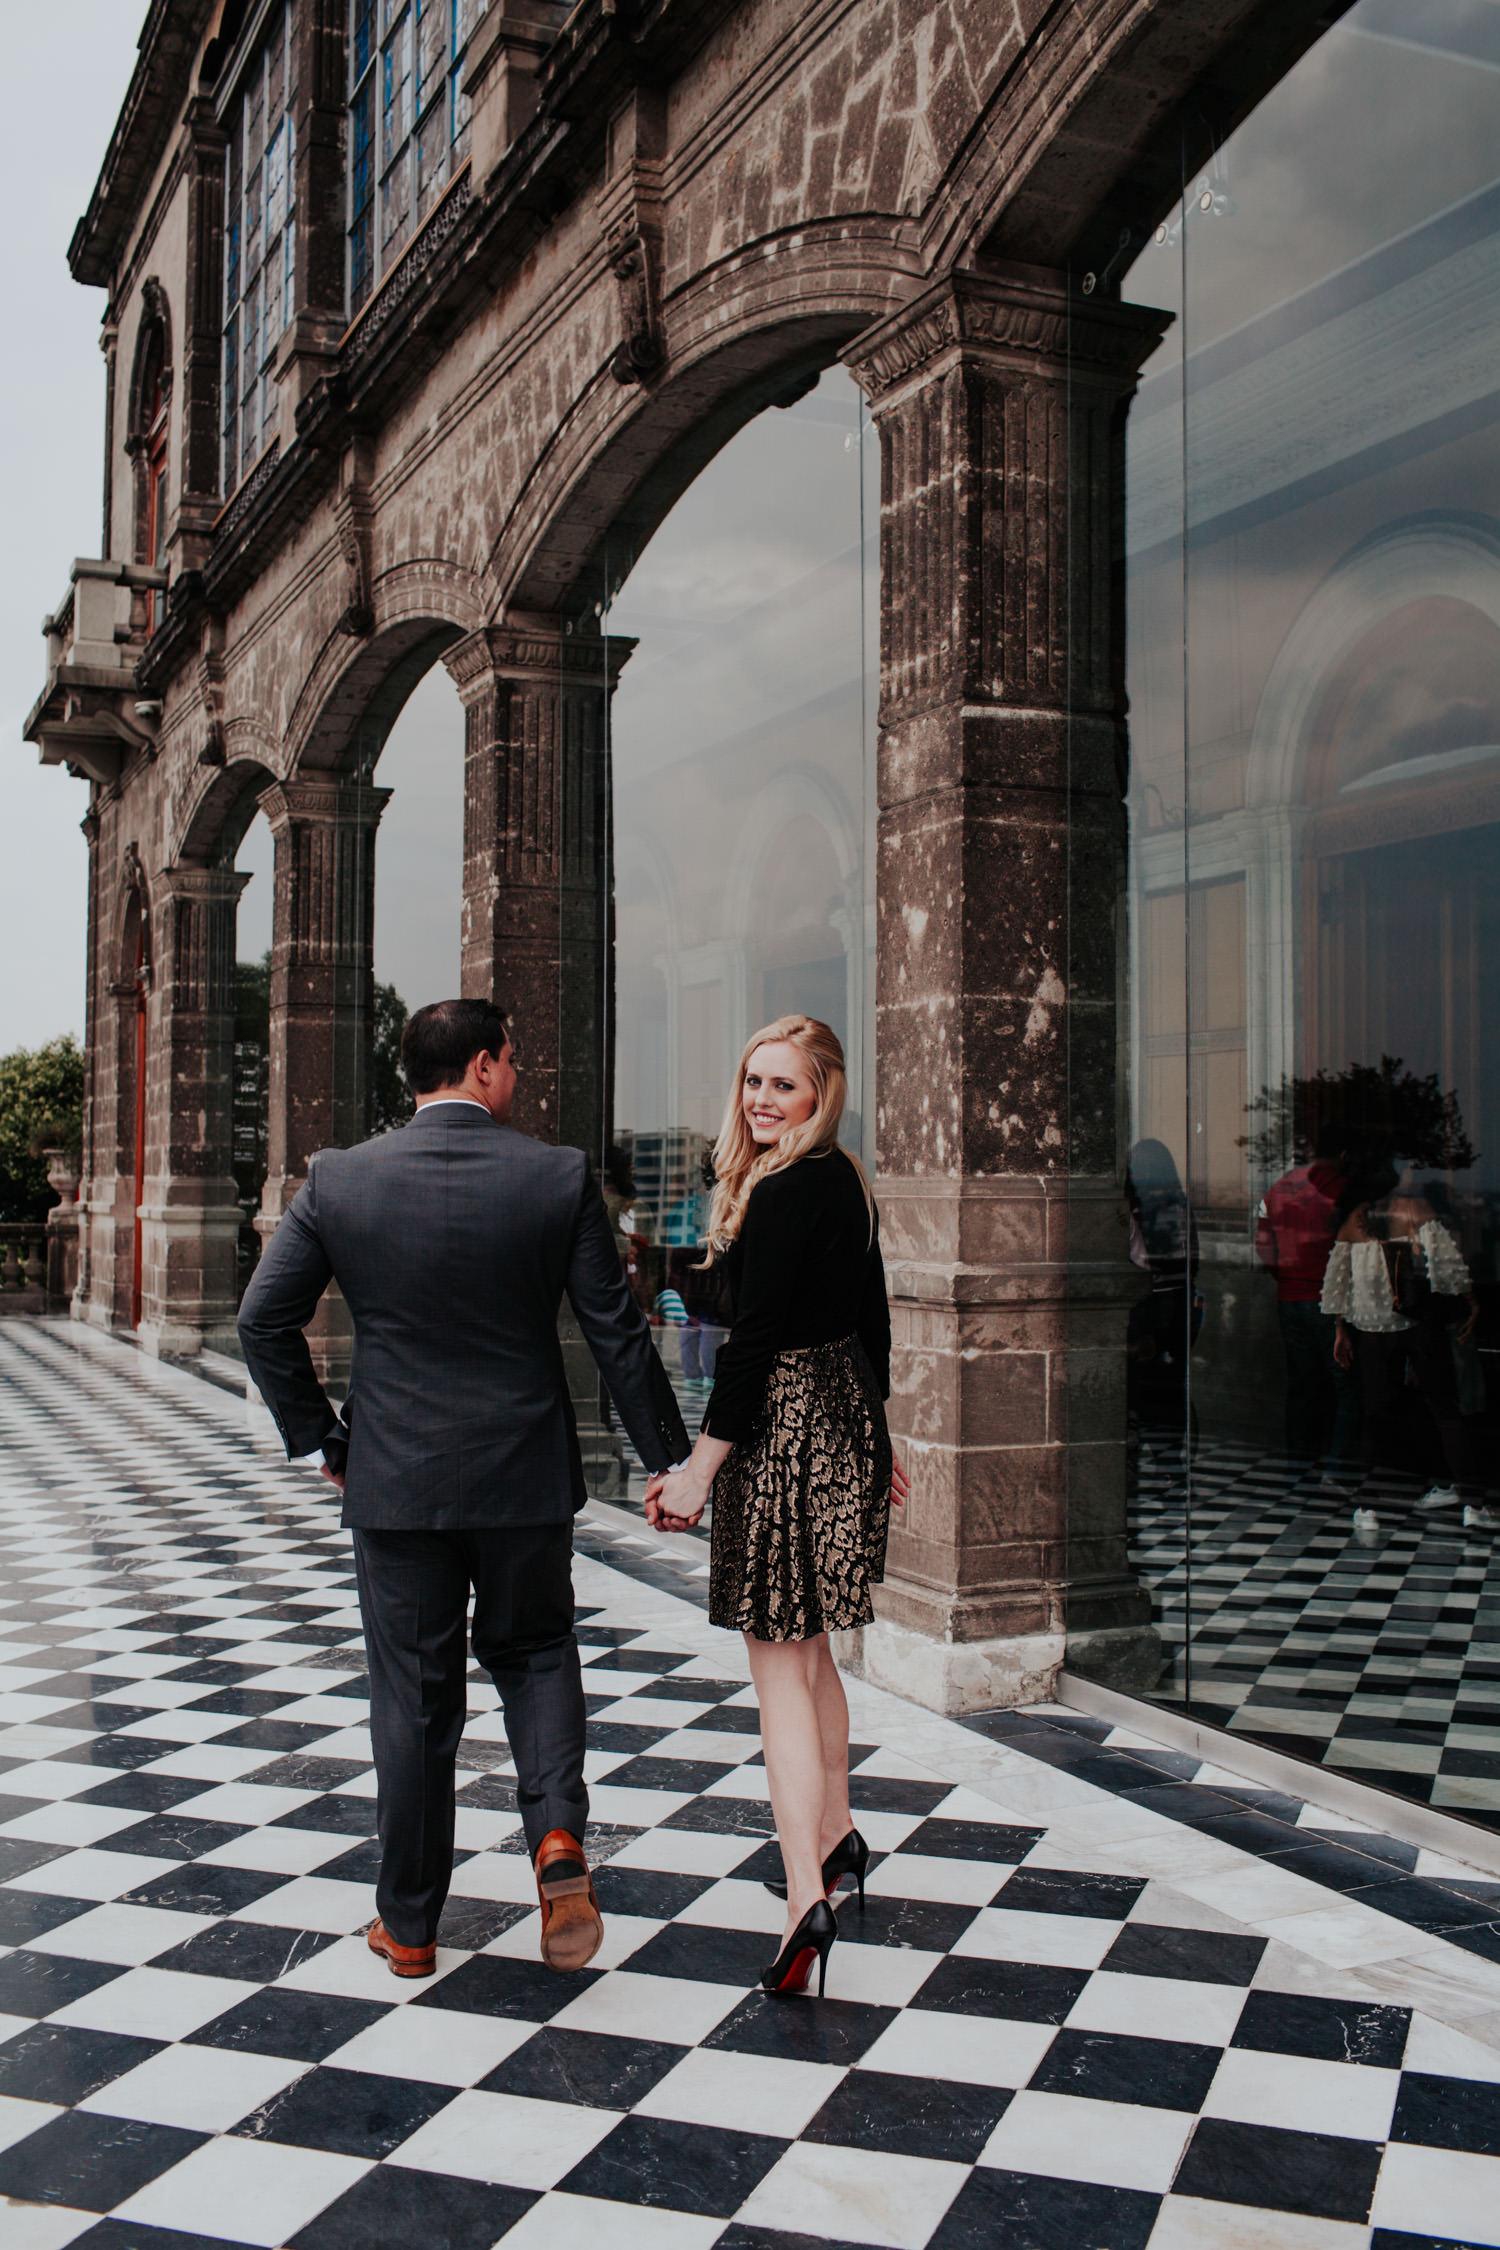 fotografo-mexico-df-boda-wedding-jw-marriot-hotel-polanco-chapultepec-pierce-96.jpg